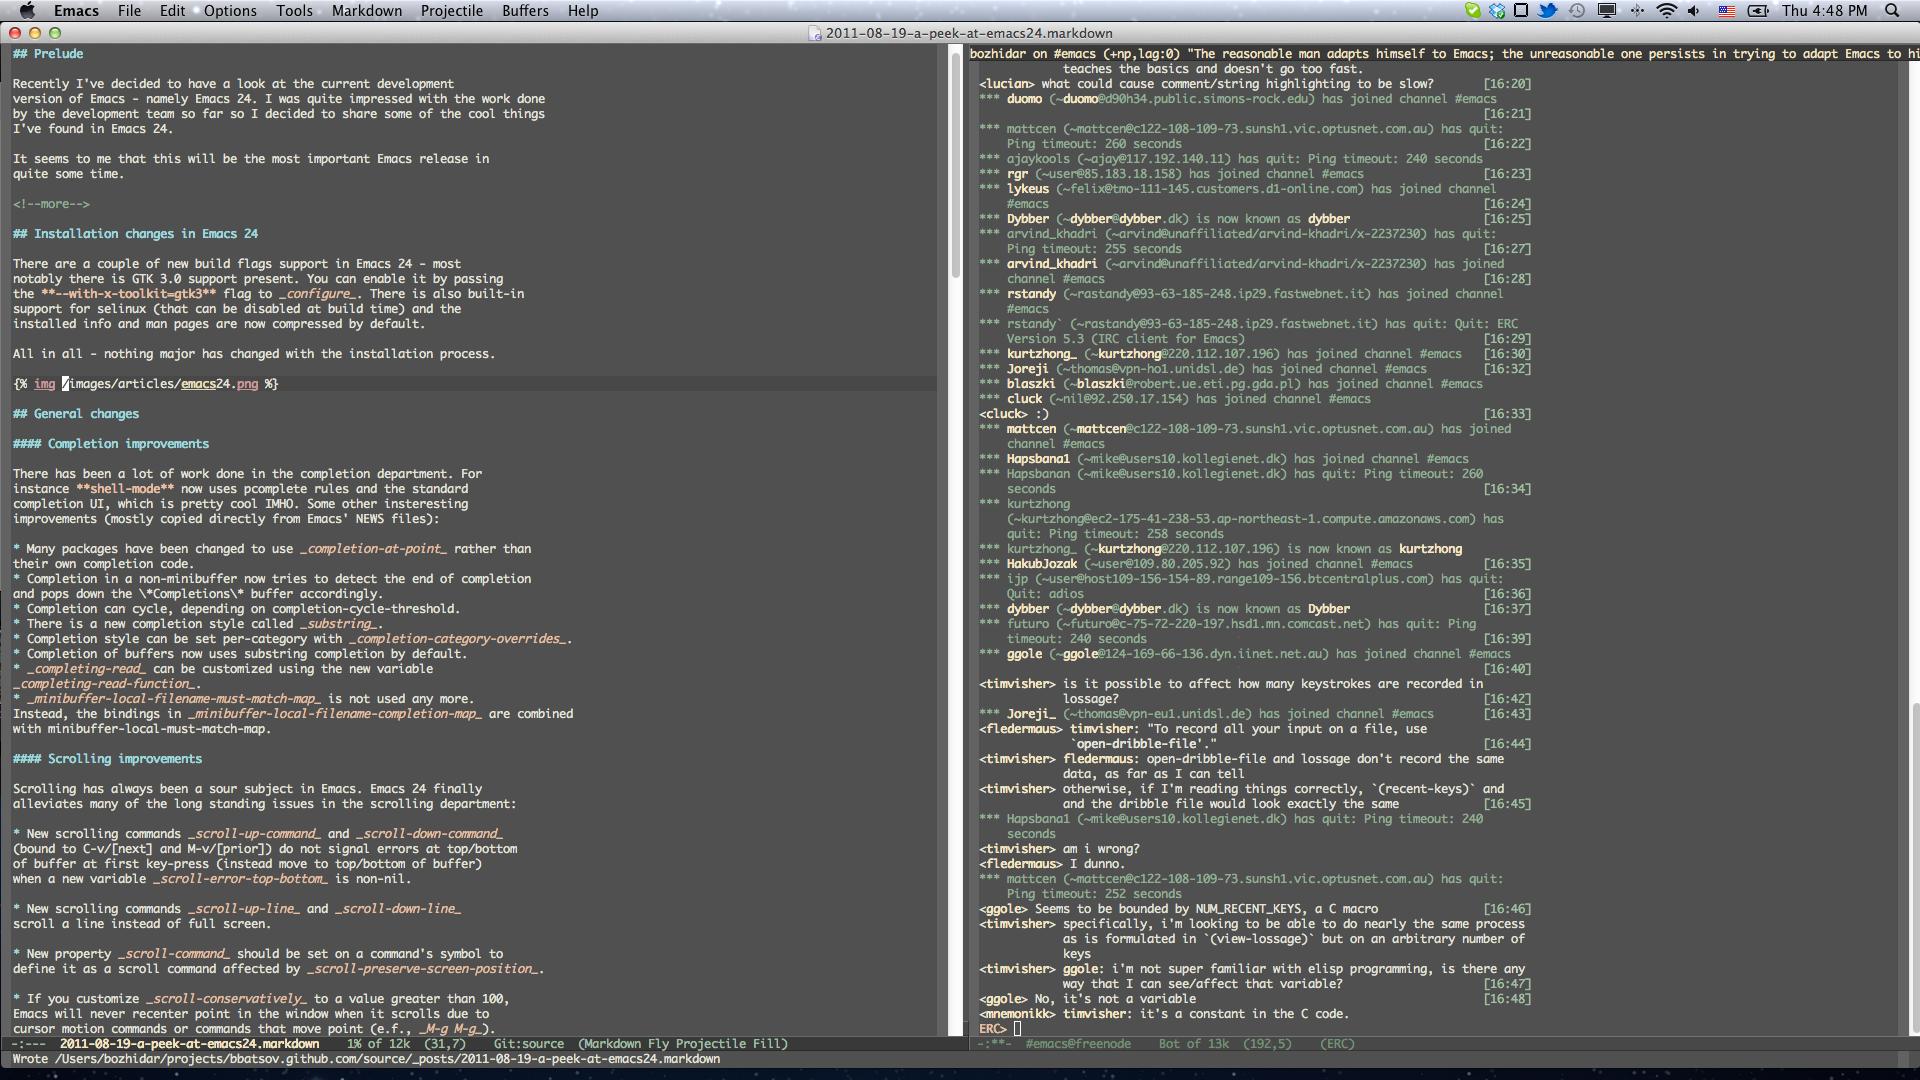 A peek at Emacs 24 · (think)